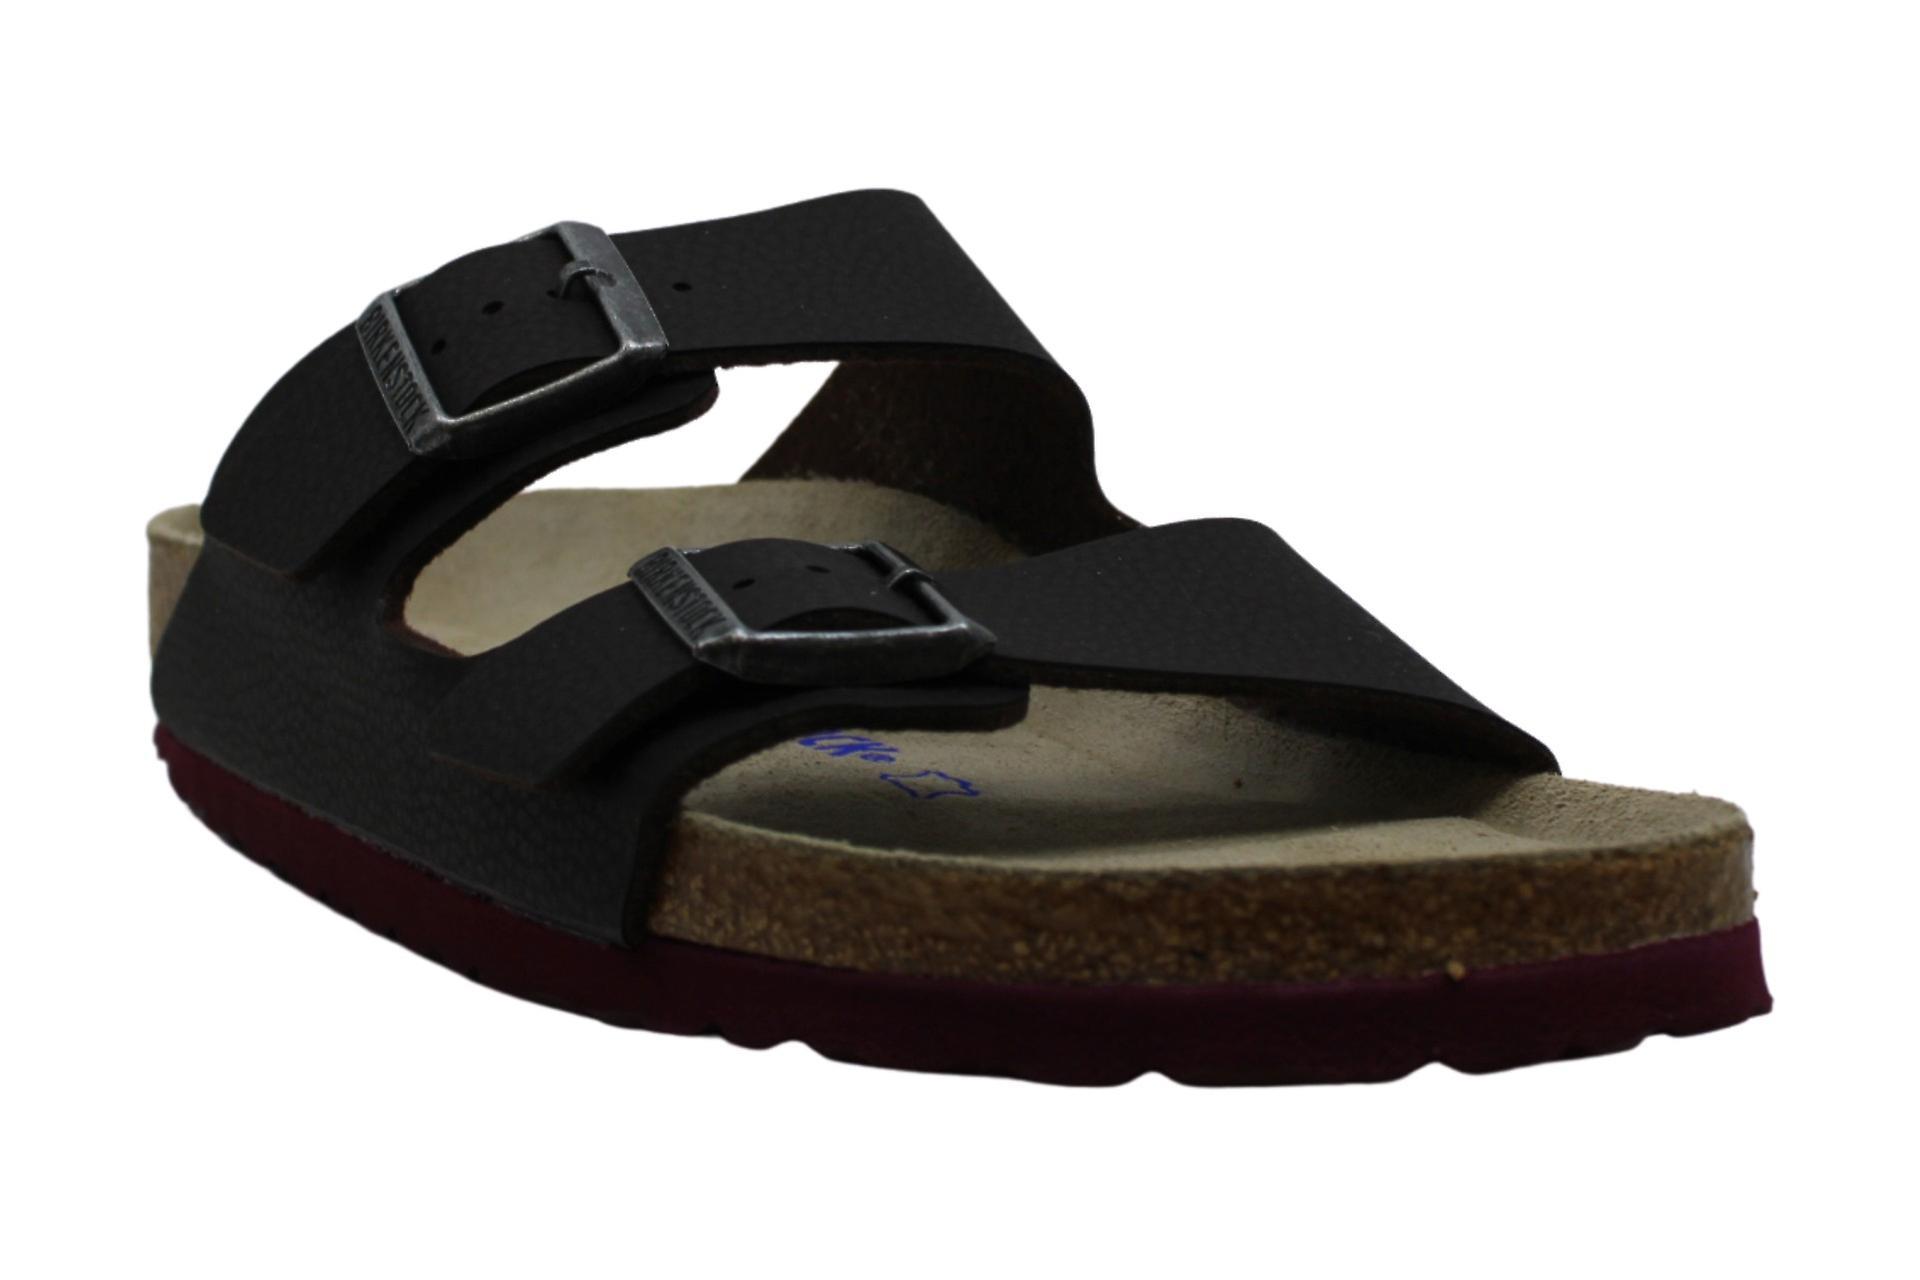 Birkenstock Men's Shoes Arizona Slip On Open Toe Slides